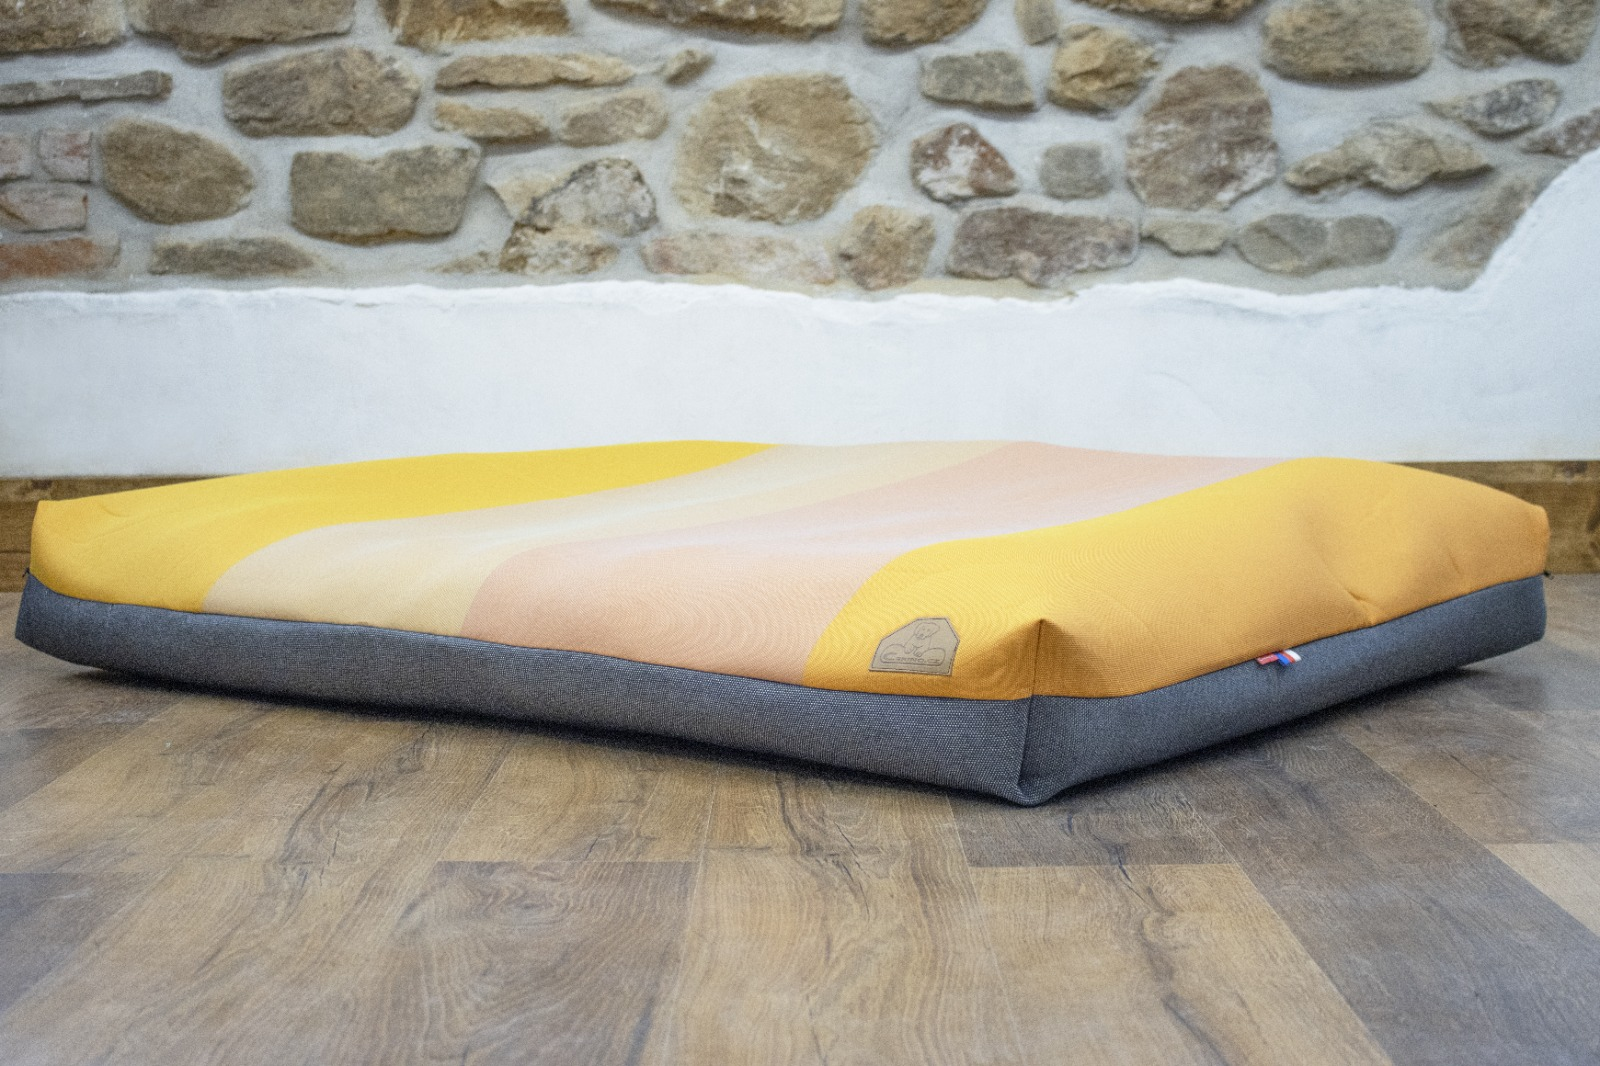 Cerino pelech Verona -  textilní potah fialový 140x100x15cm